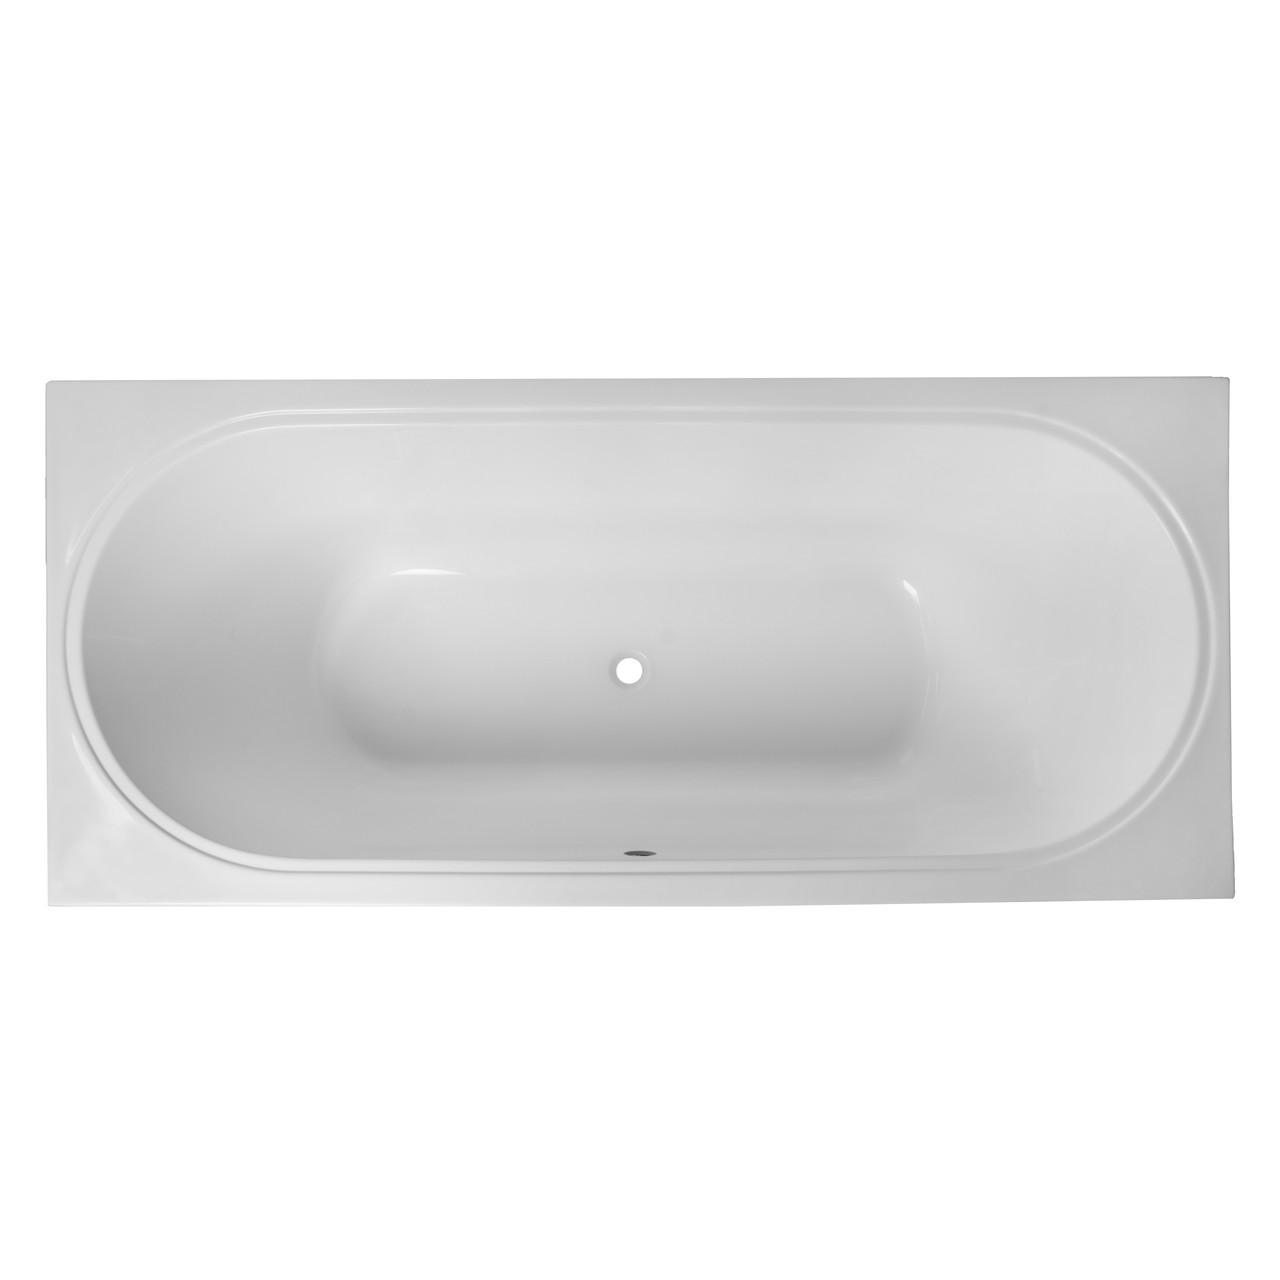 Ванна VOLLE OLIVA TS-1880500